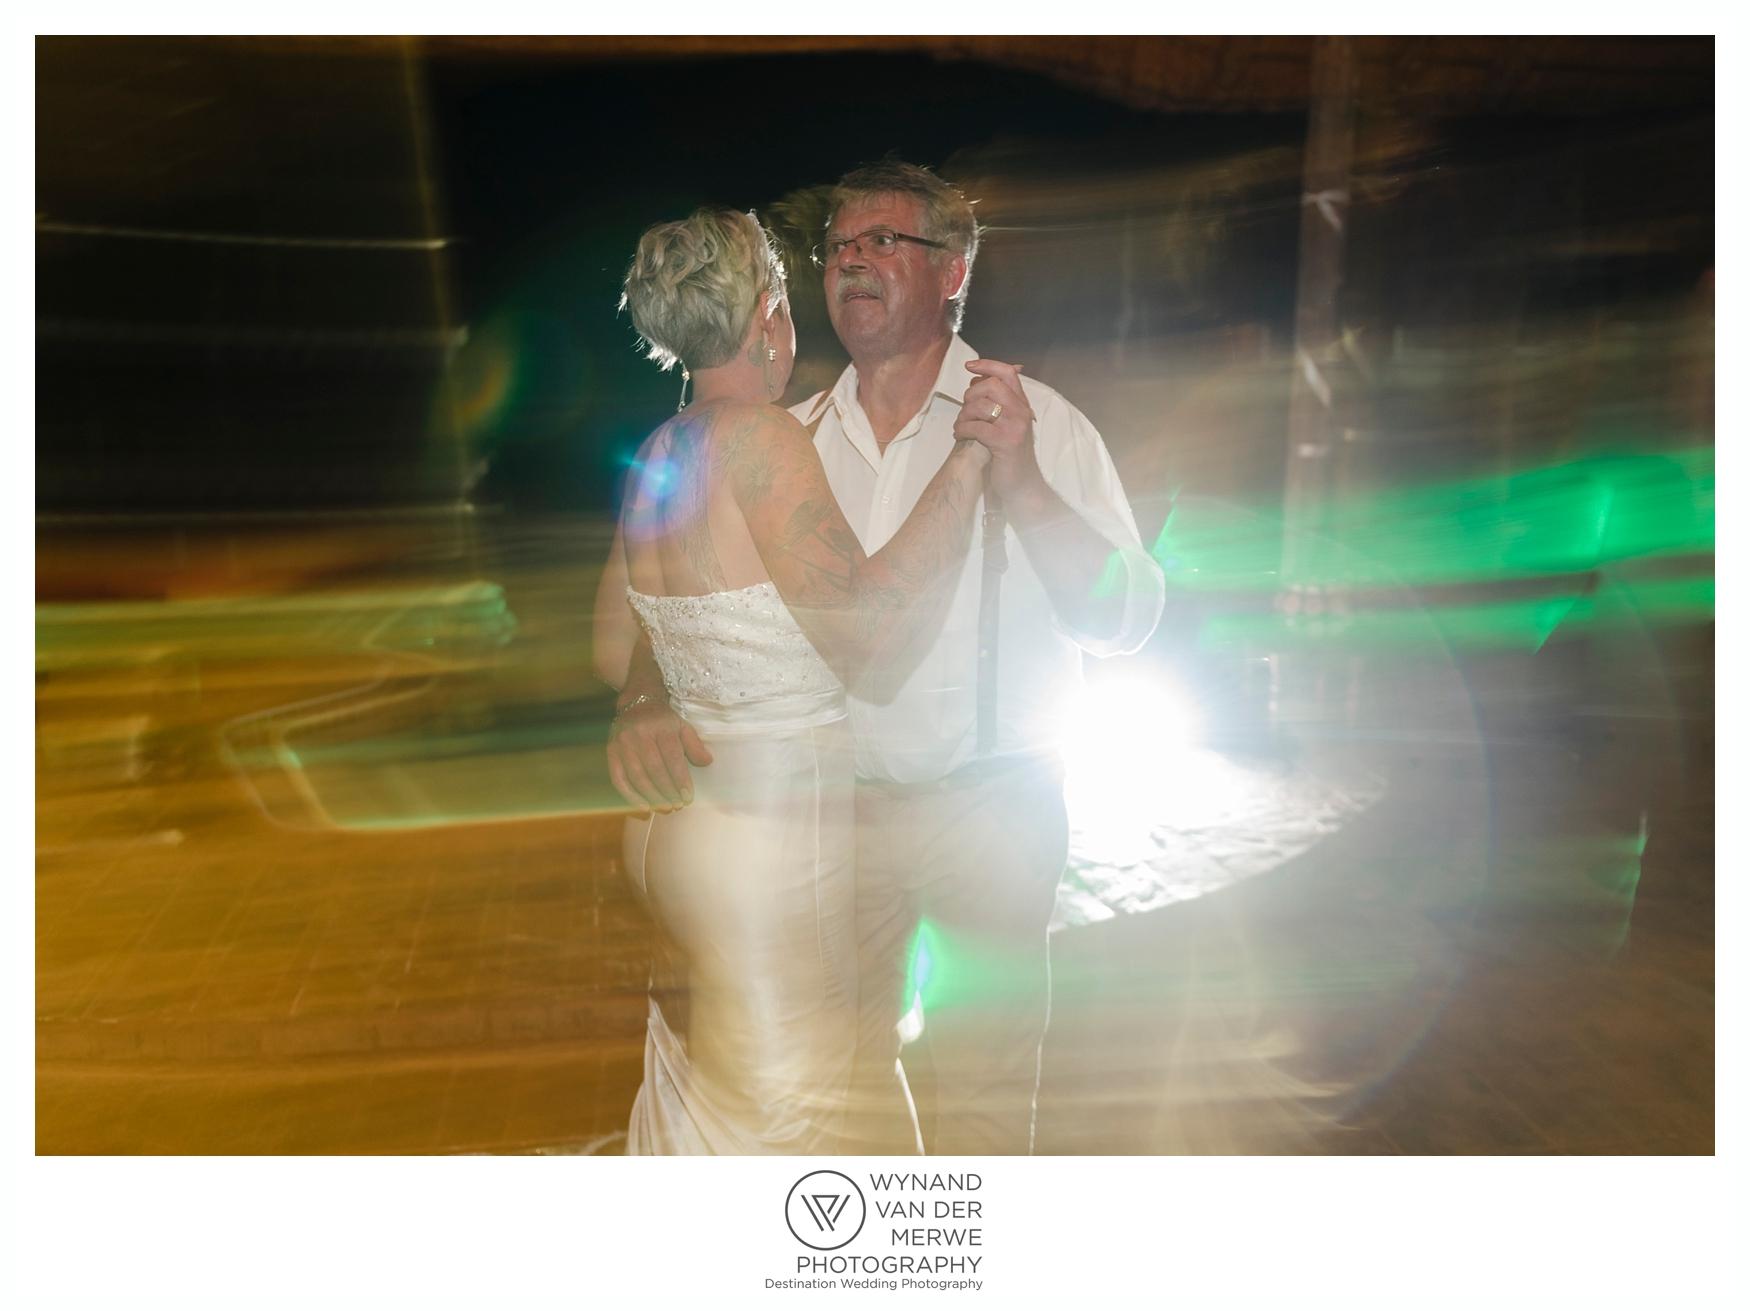 WynandvanderMerwe_weddingphotography_bushveldwedding_northam_bushveld_limpopowedding_limpopo_southafrica-410.jpg